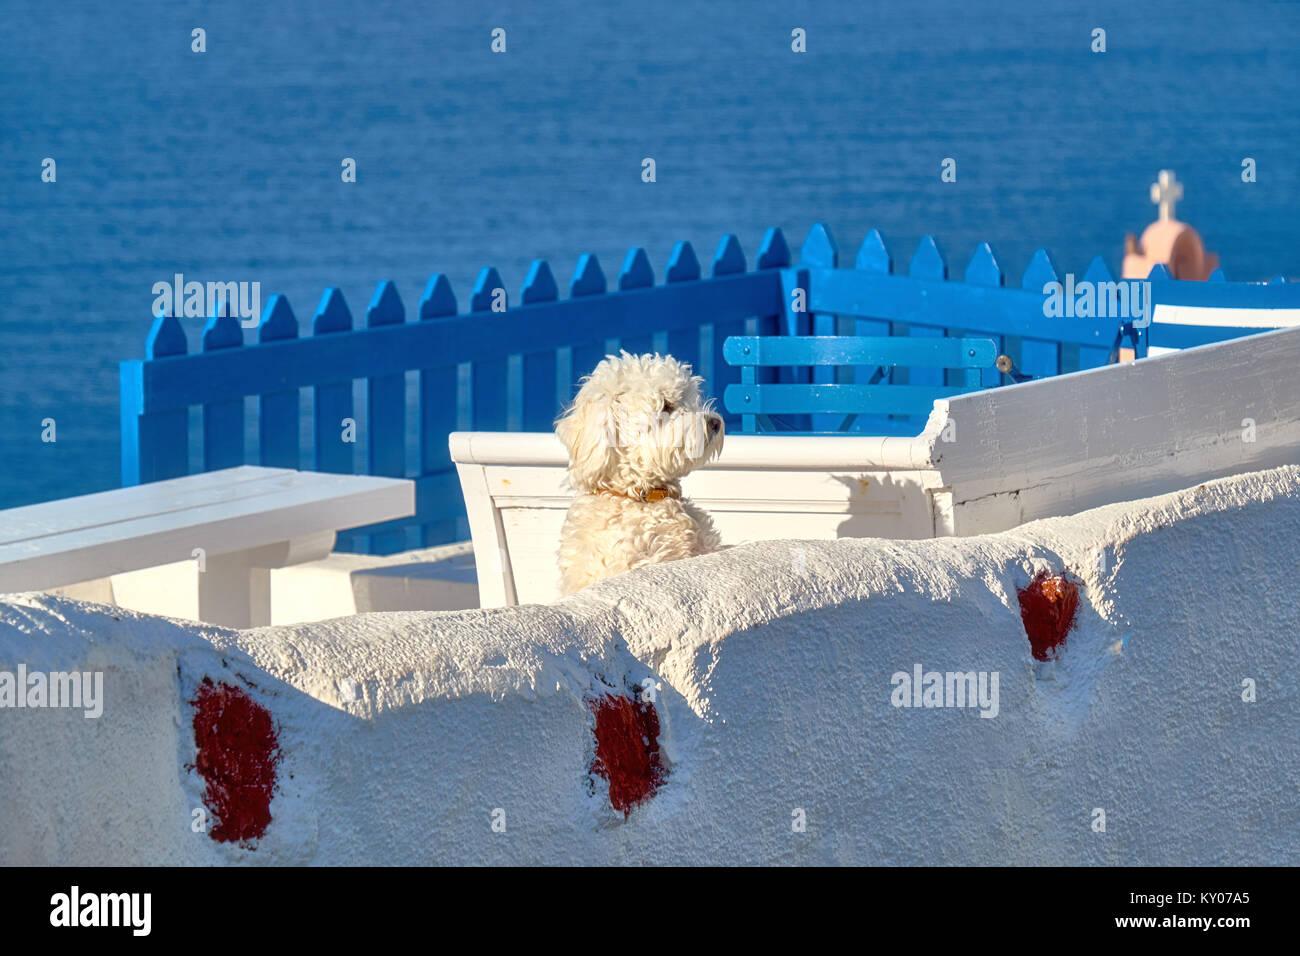 Curious white lapdog on white terrase overooking the sea  in Oia, Santorini, Greece. - Stock Image